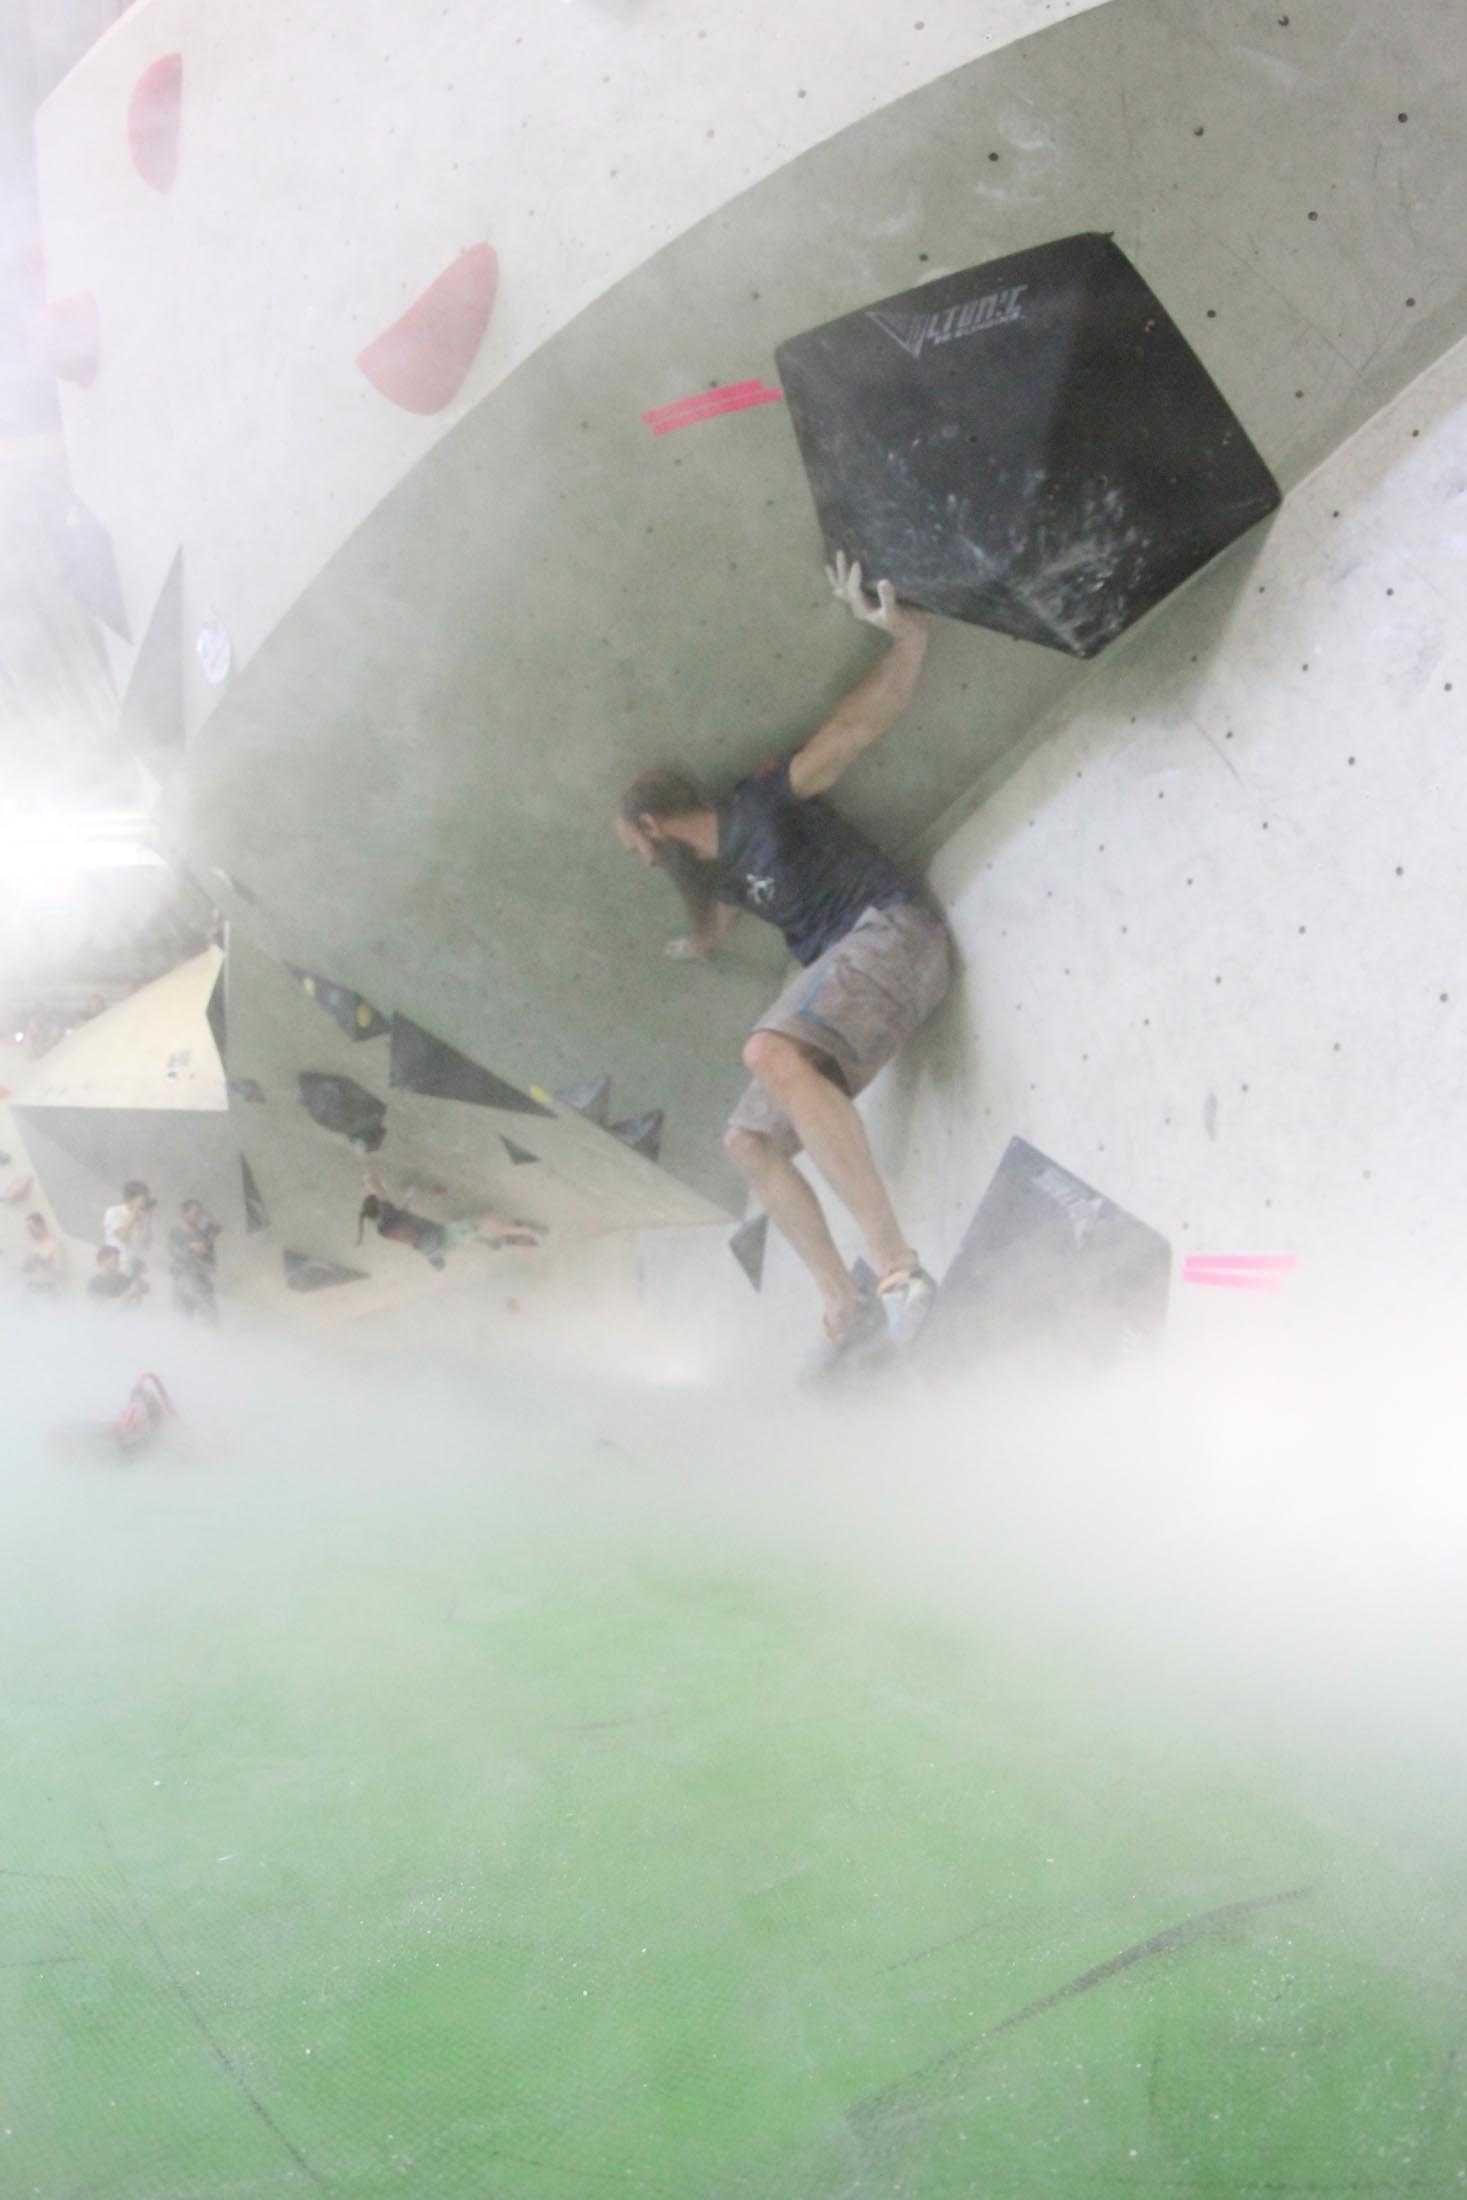 Finale, internationaler bouldercup Frankenjura 2016, BLOCKHELDEN Erlangen, Mammut, Bergfreunde.de, Boulderwettkampf07092016693